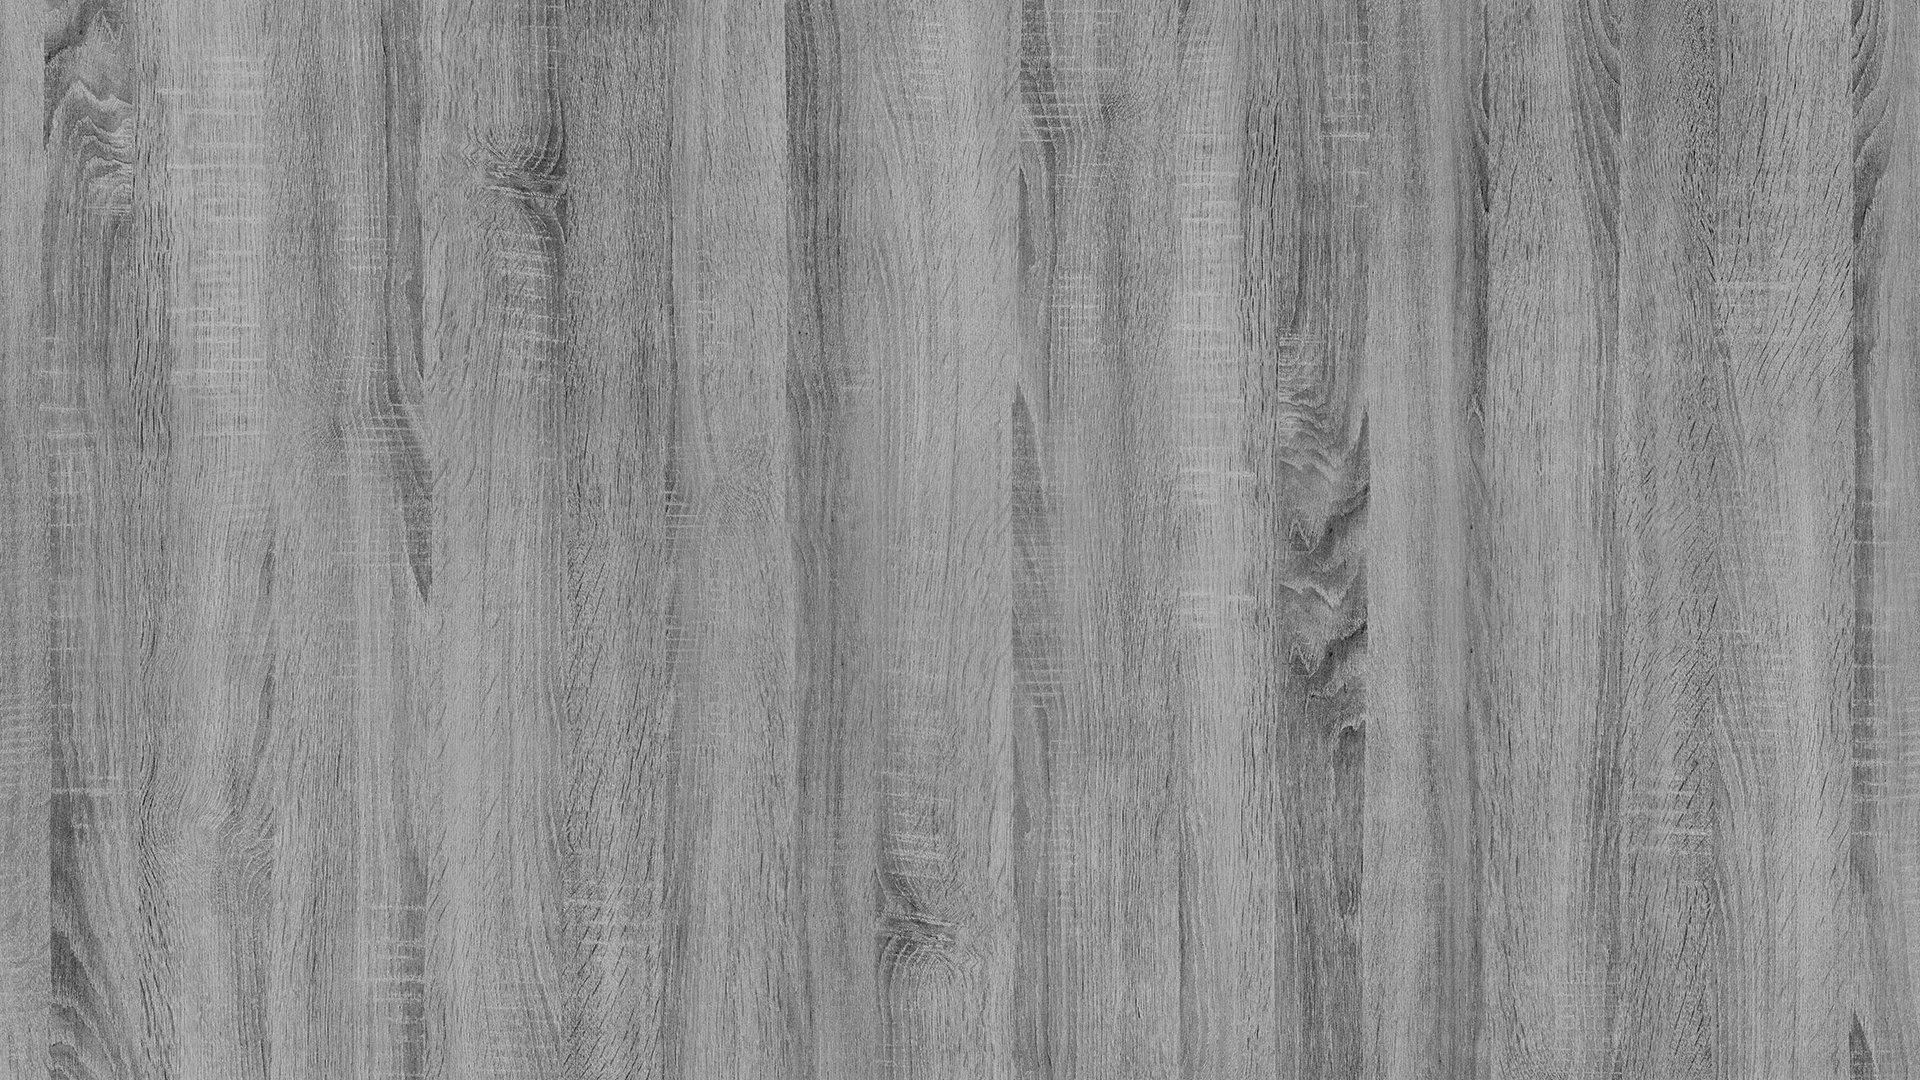 Oak wood texture | FlyingArchitecture